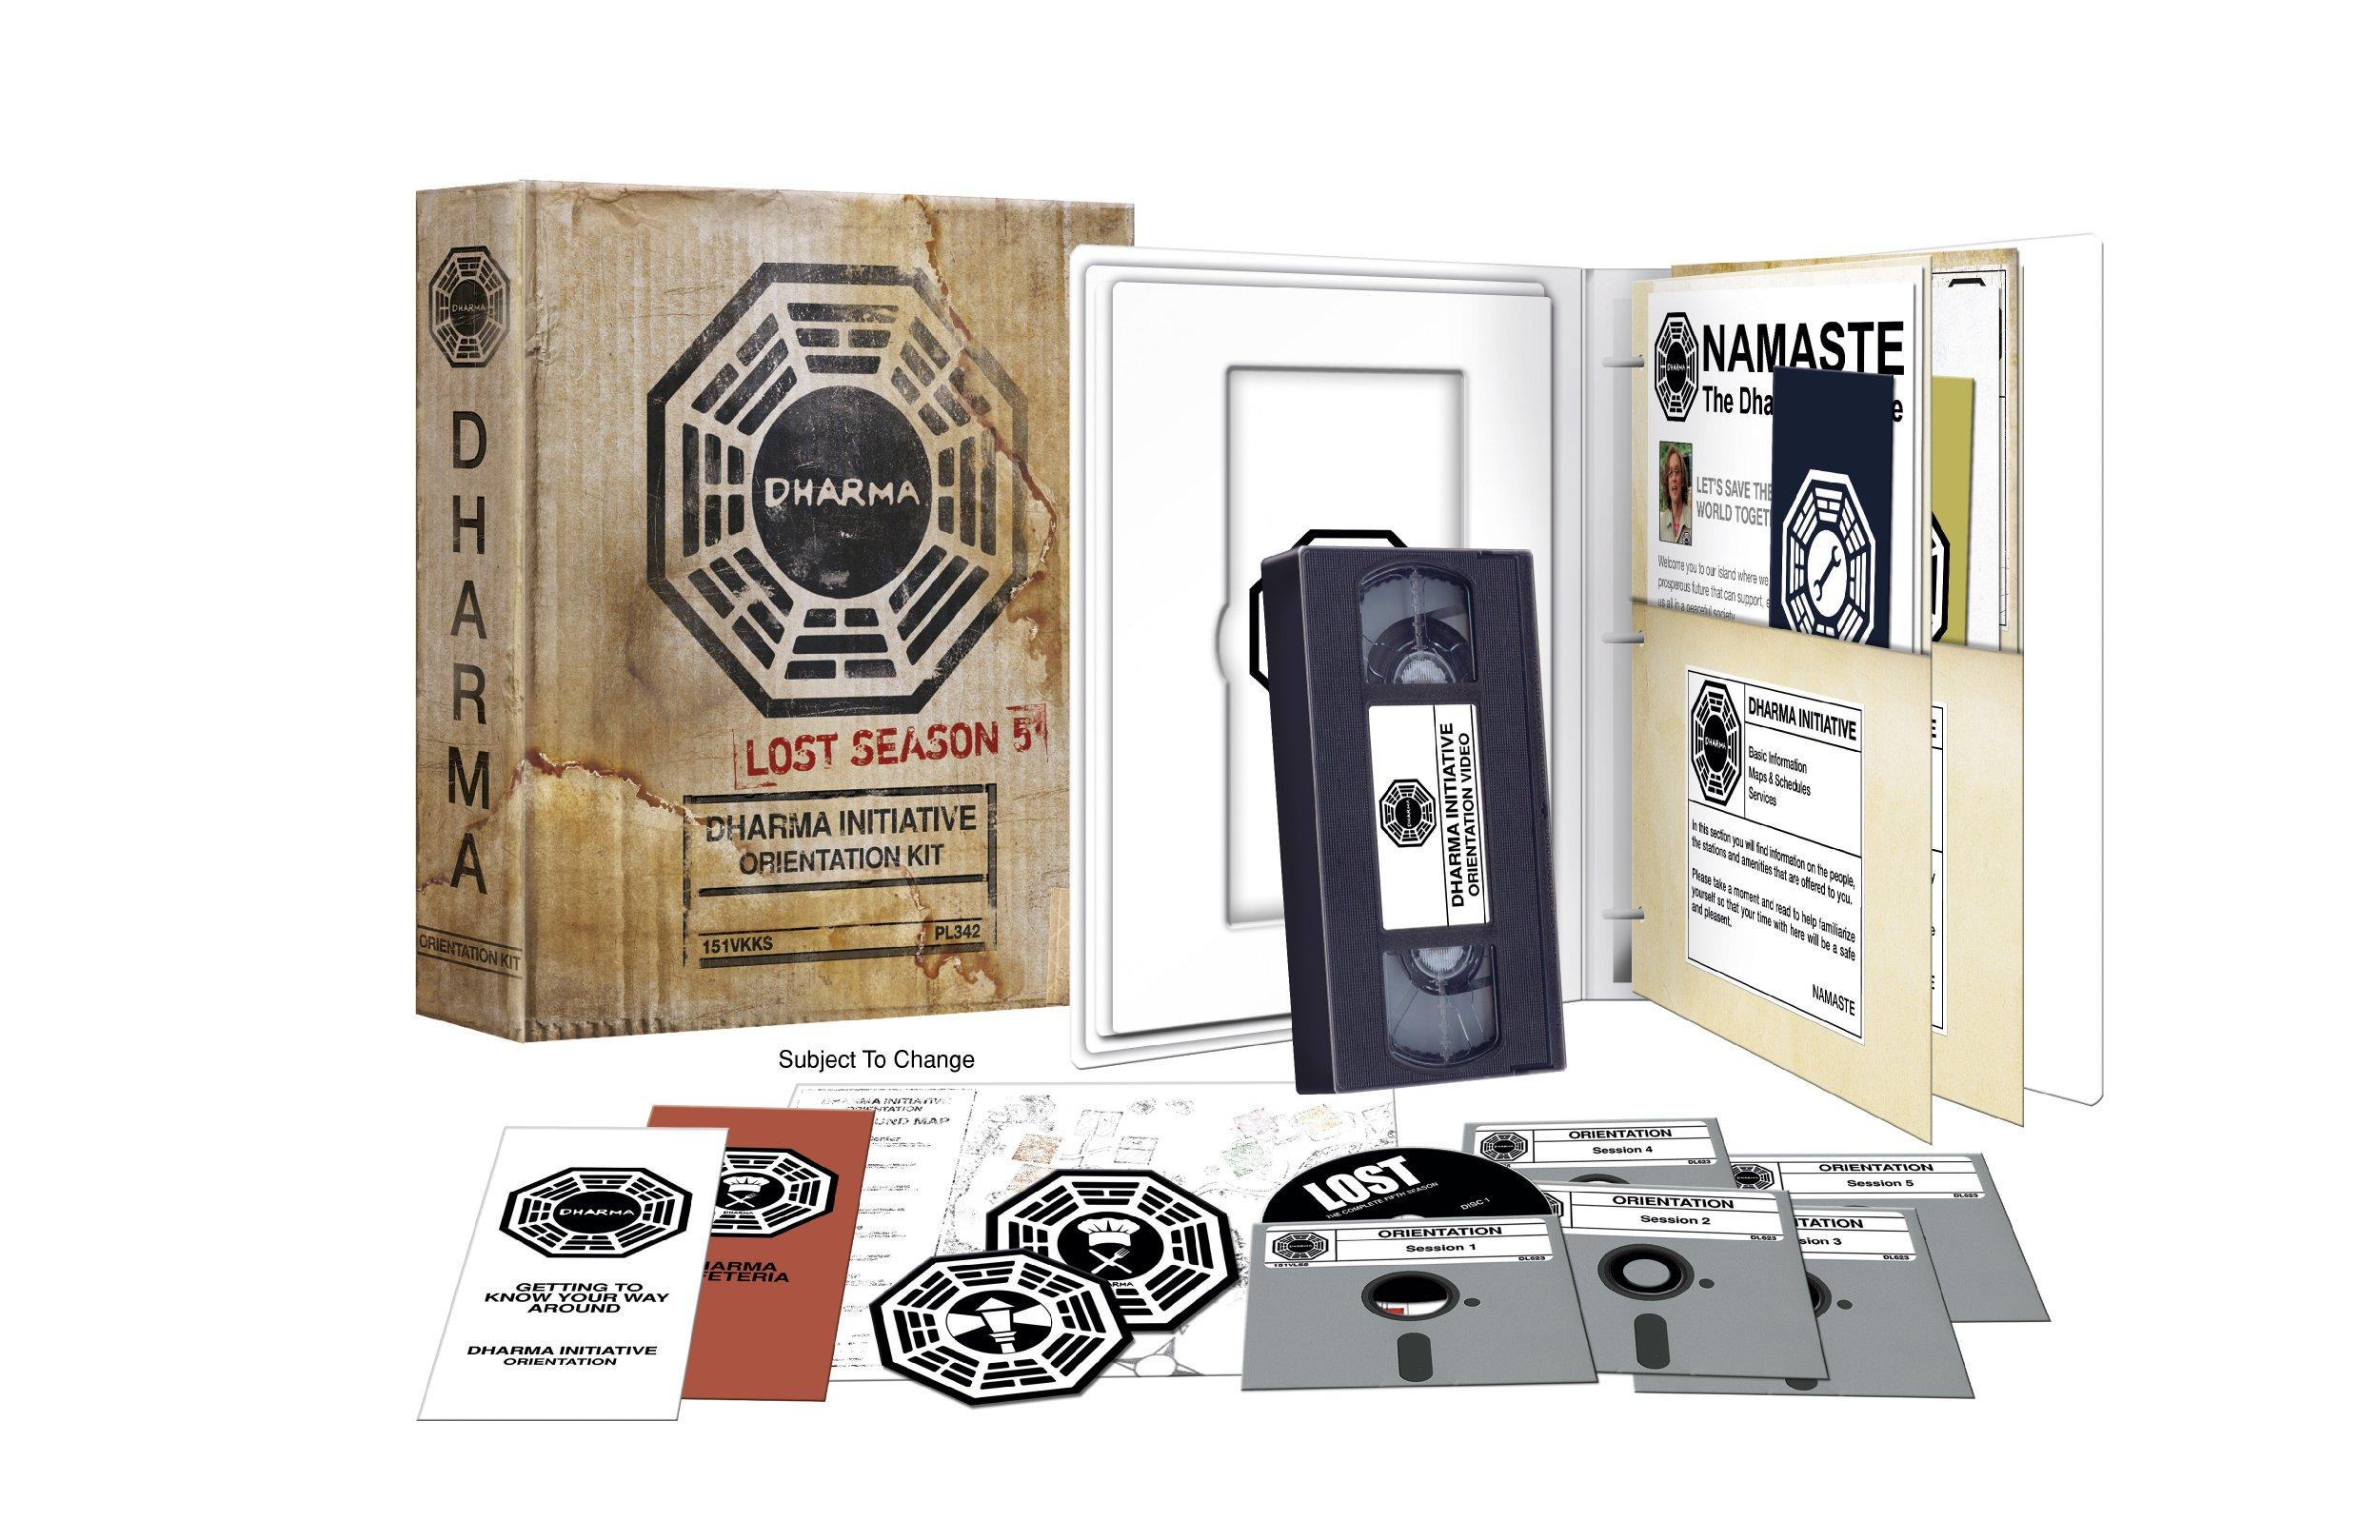 Lost: Season 5 Dharma Initiative Orientation Kit